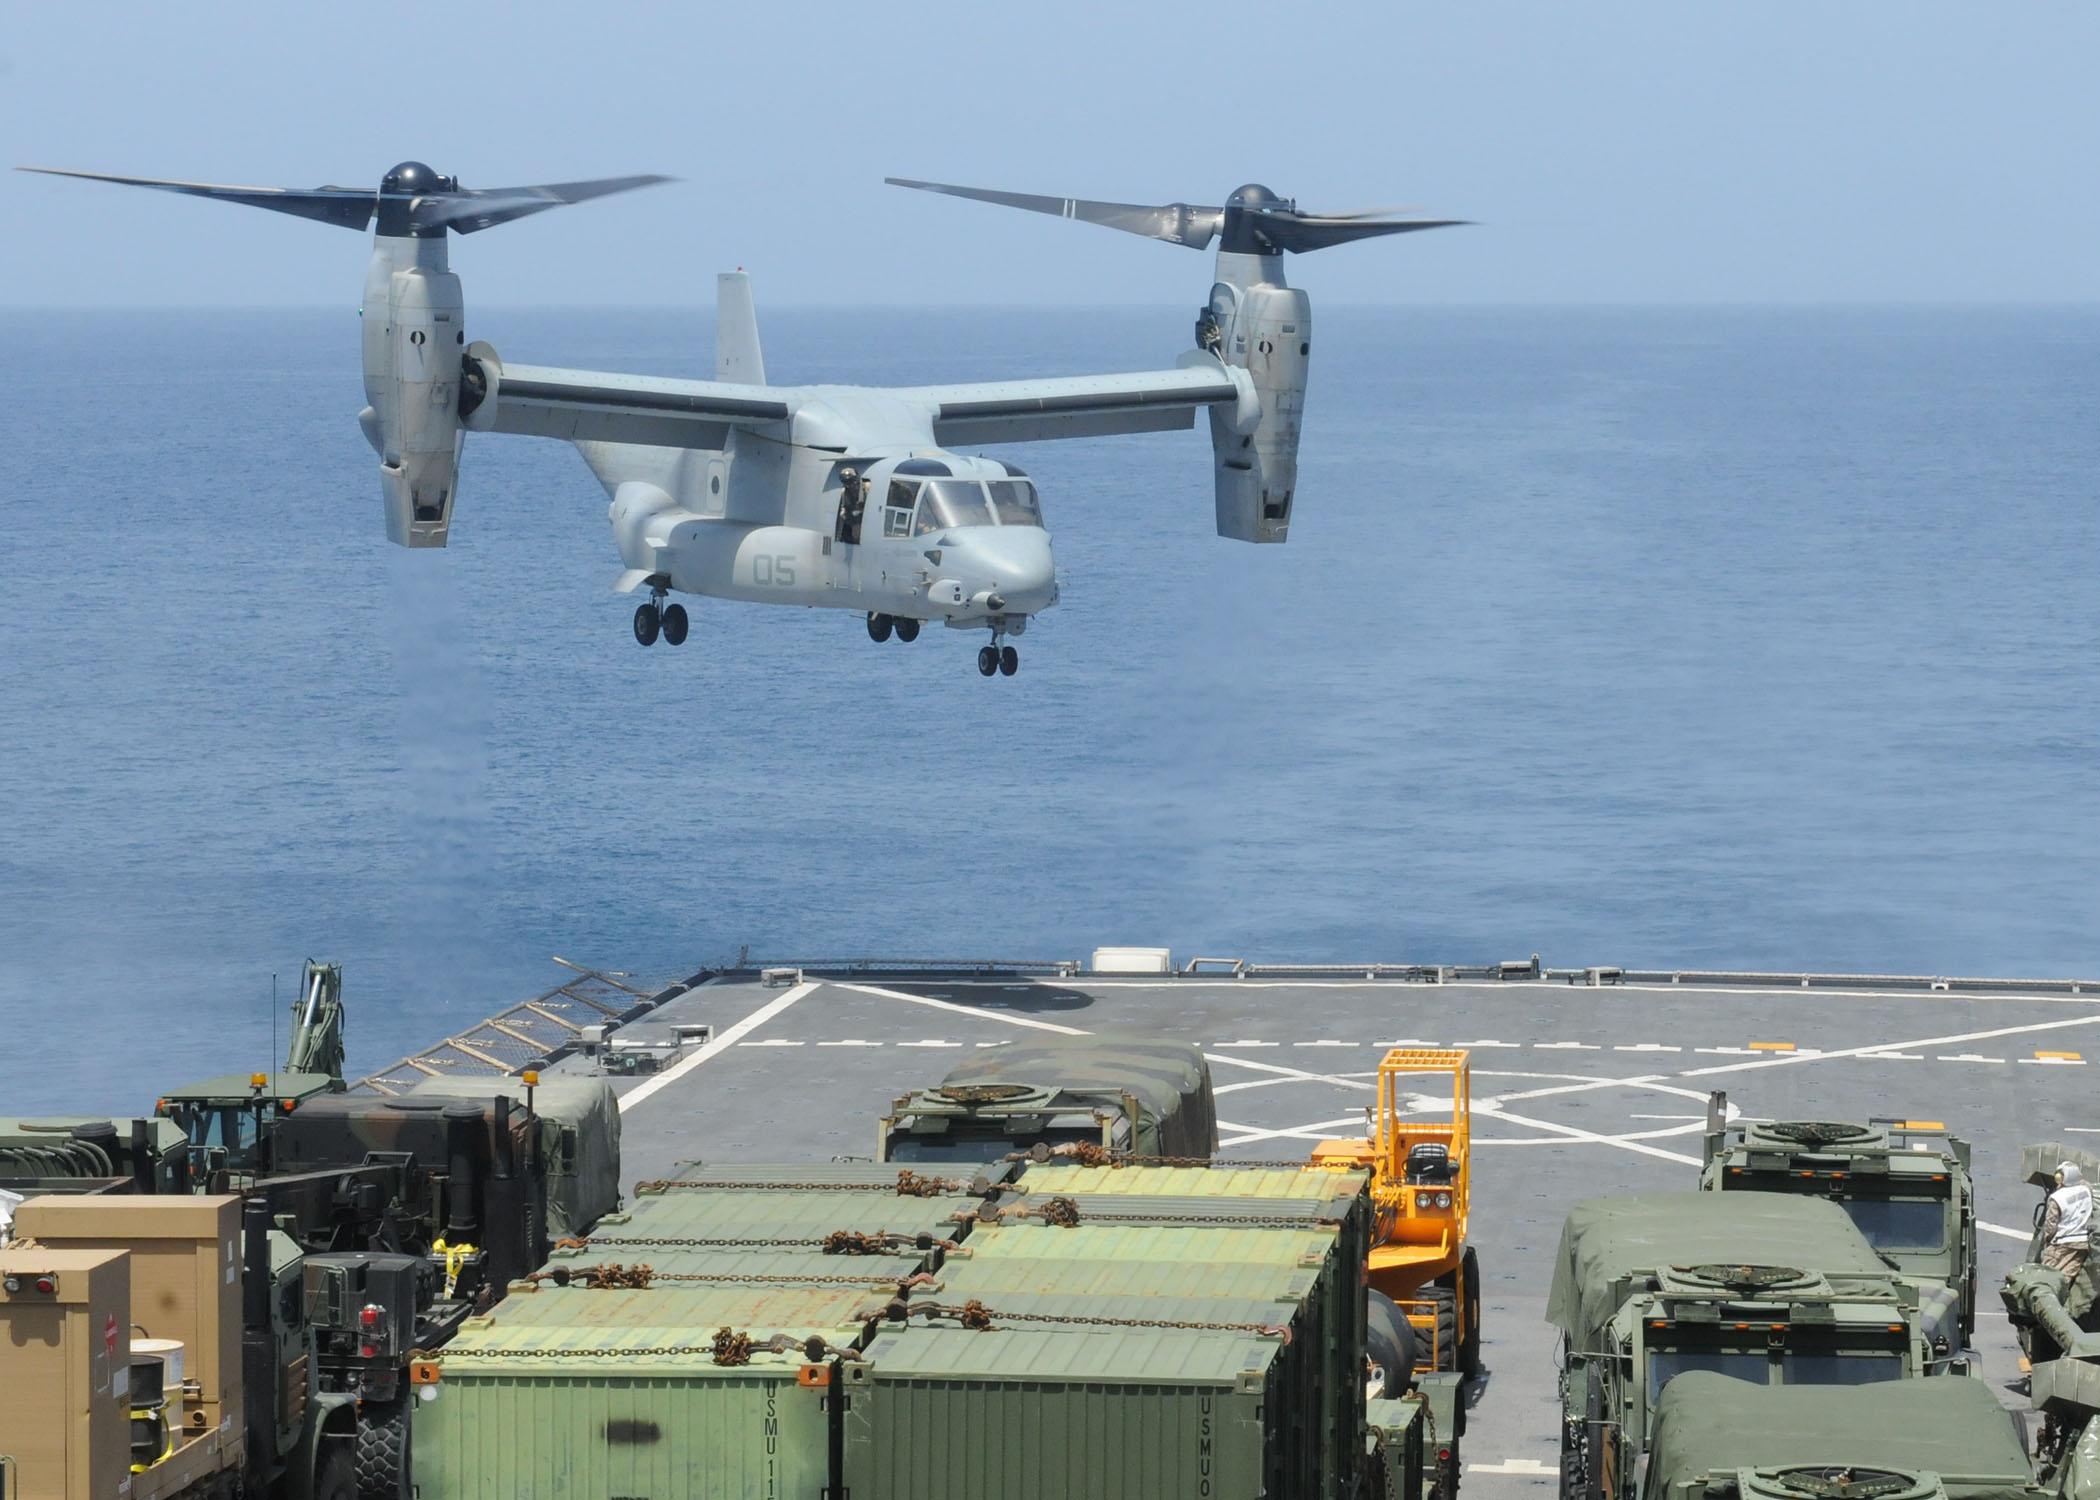 US_Navy_100716-N-8069G-231_A_Marine_Corps_V-22_Osprey_prepares_to_land_on_the_flight_deck_of_USS_Carter_Hall_(LSD_50).jpg